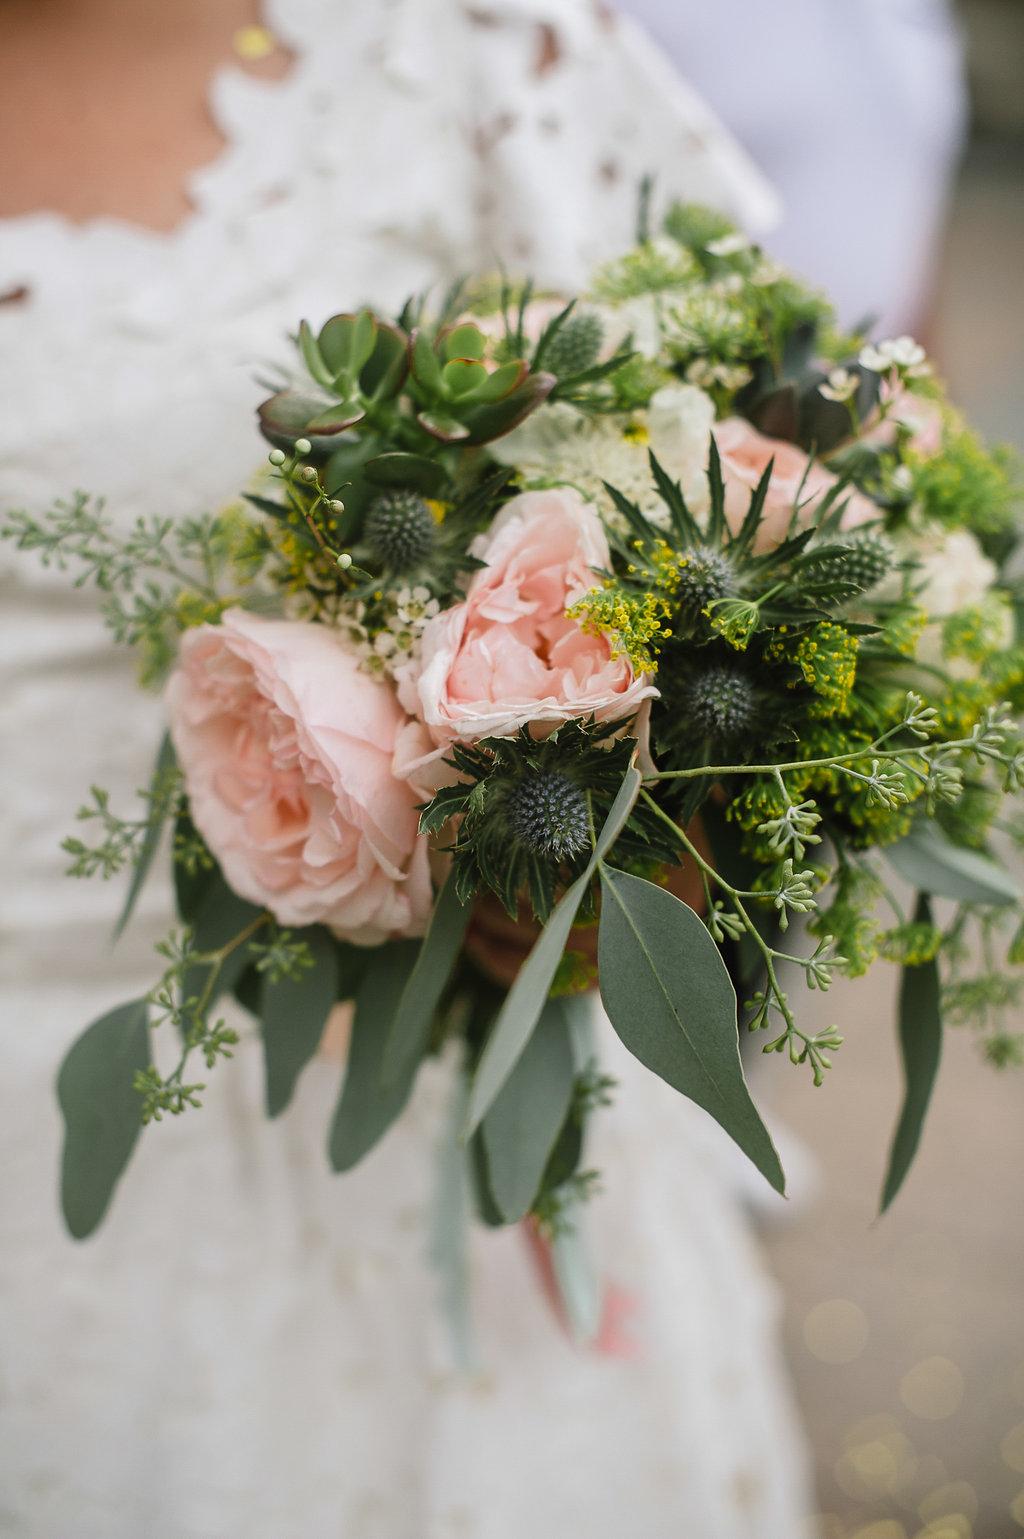 bouquet-mariee-champetre-vegetal-mariage